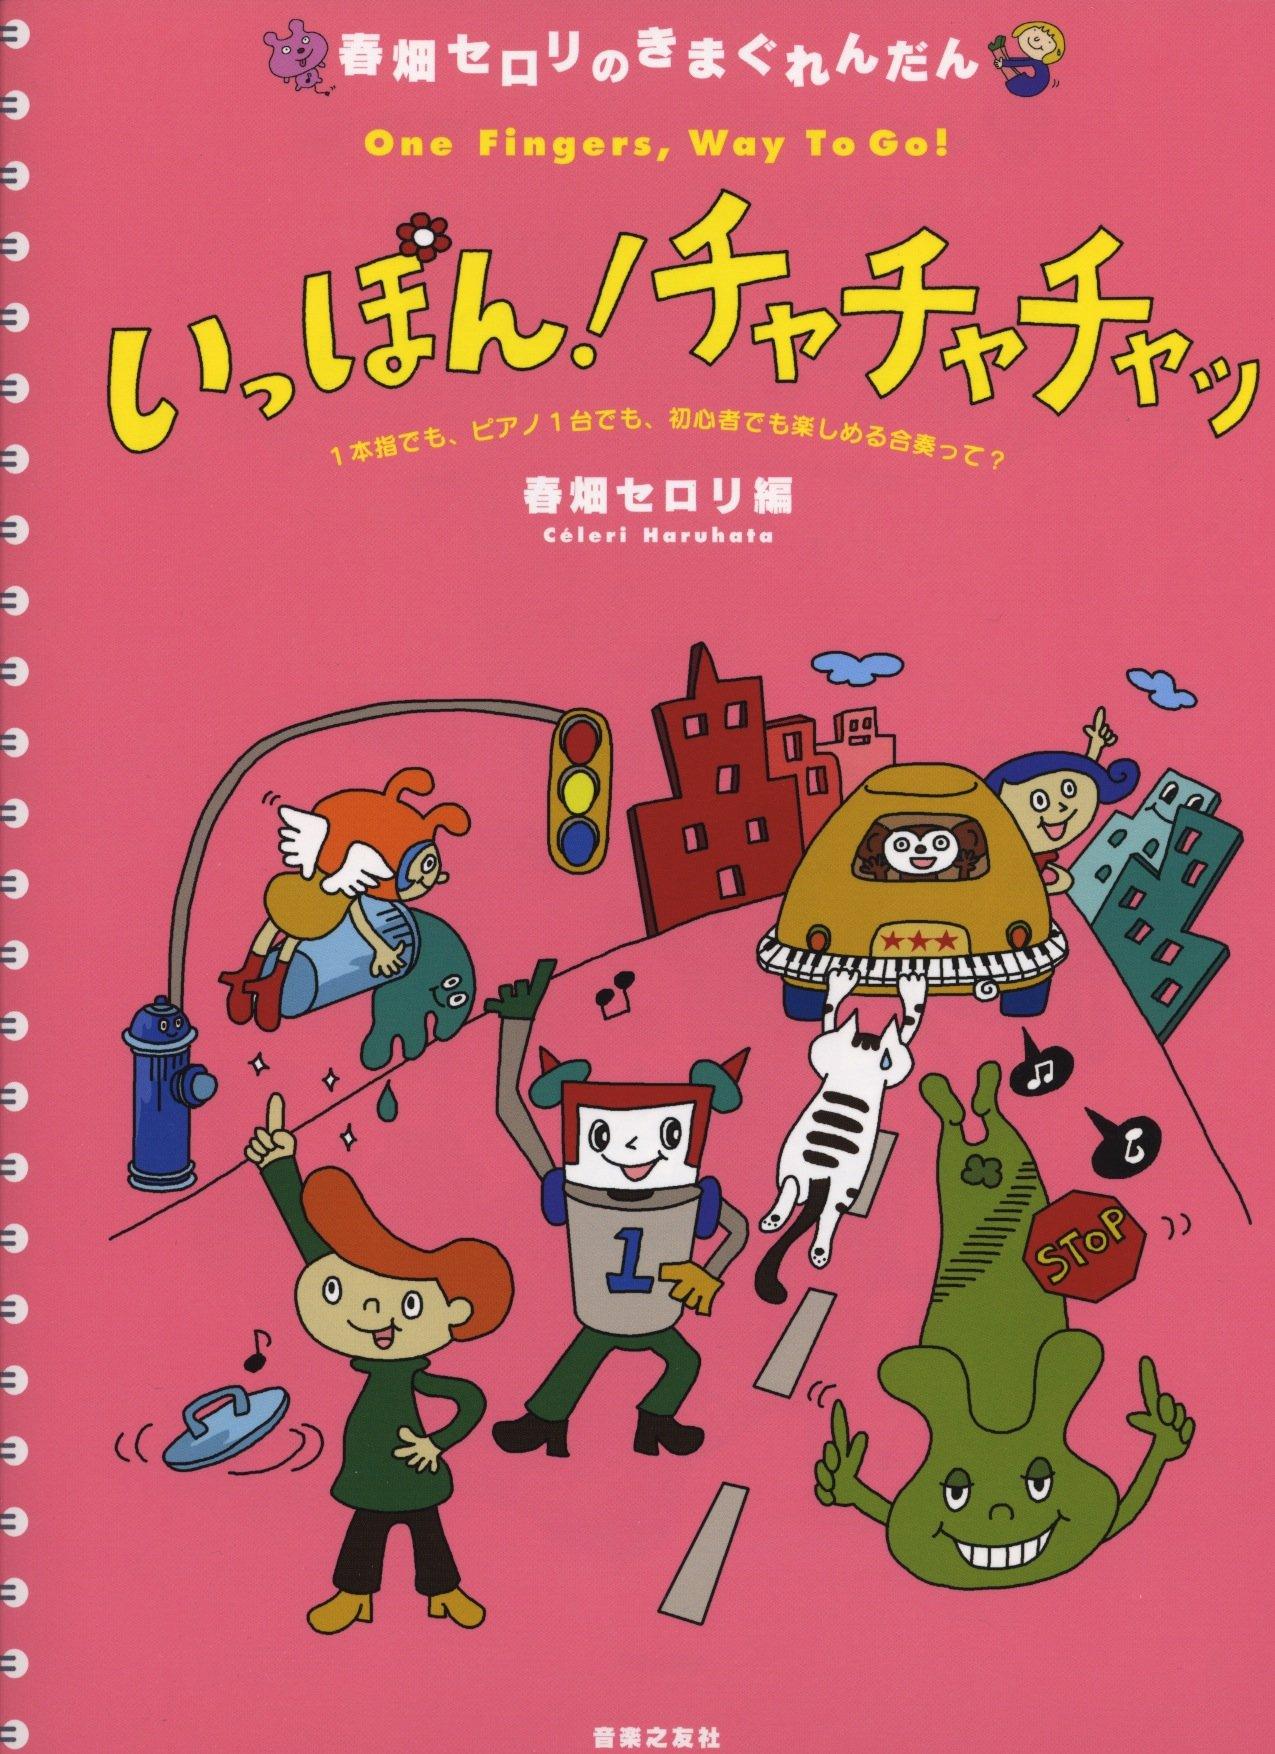 Download Ippon chachachatu : Haruhata serori no kimagurendan ebook